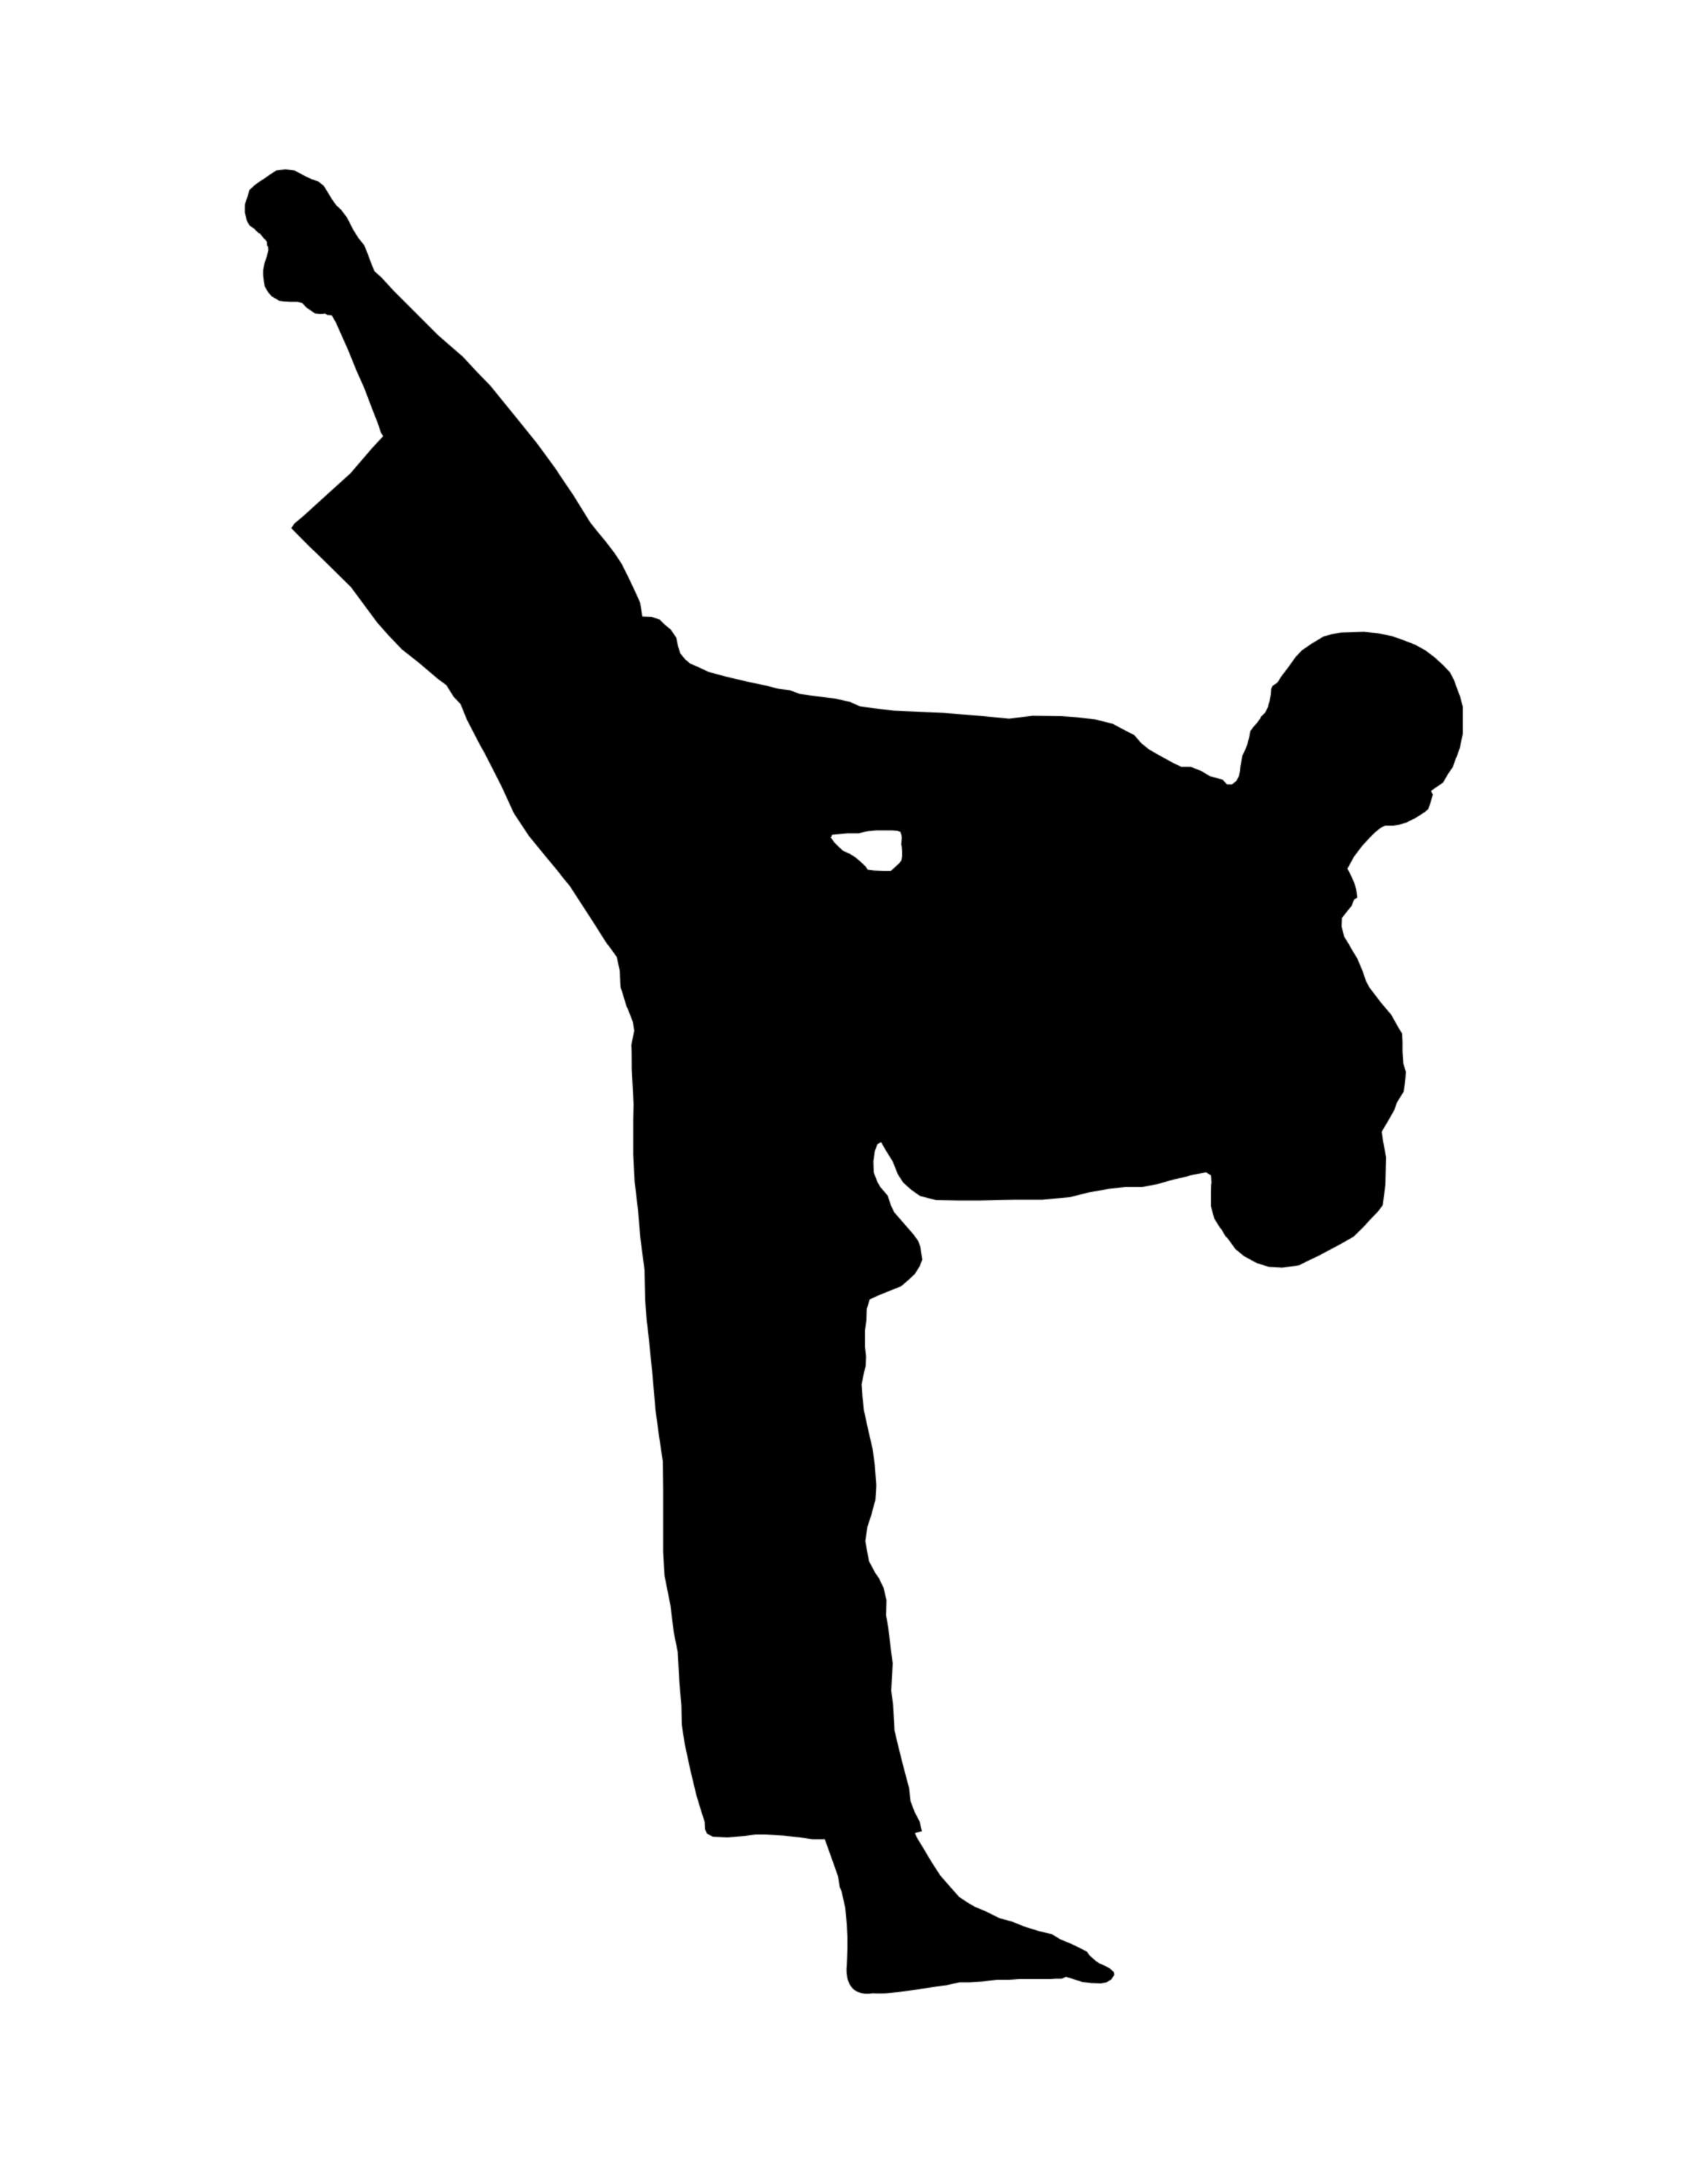 Best Martial Arts Studios In The Inland Empire